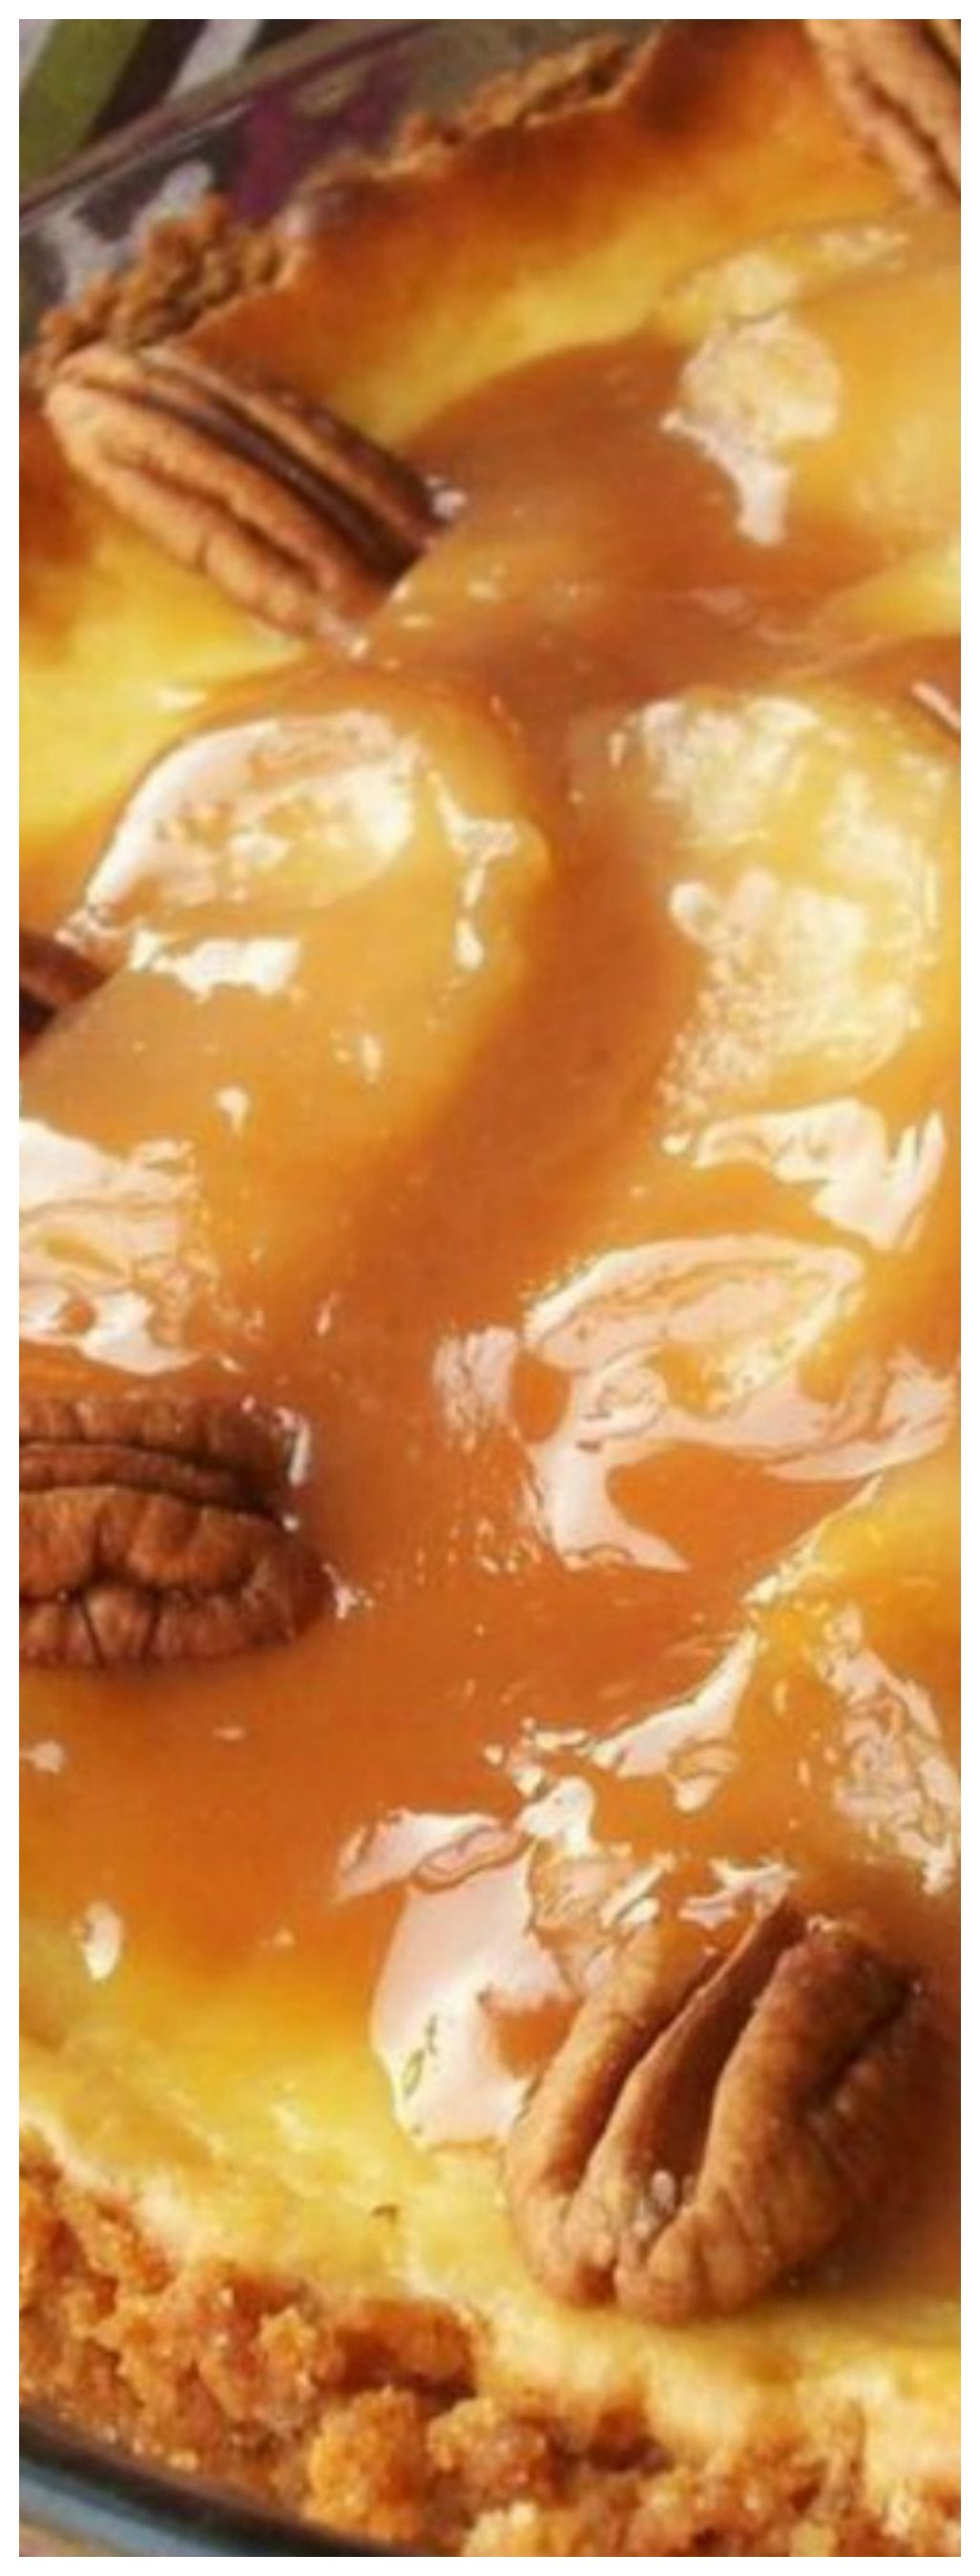 Caramel Apple Cheesecake Recipe #caramelapplecheesecake